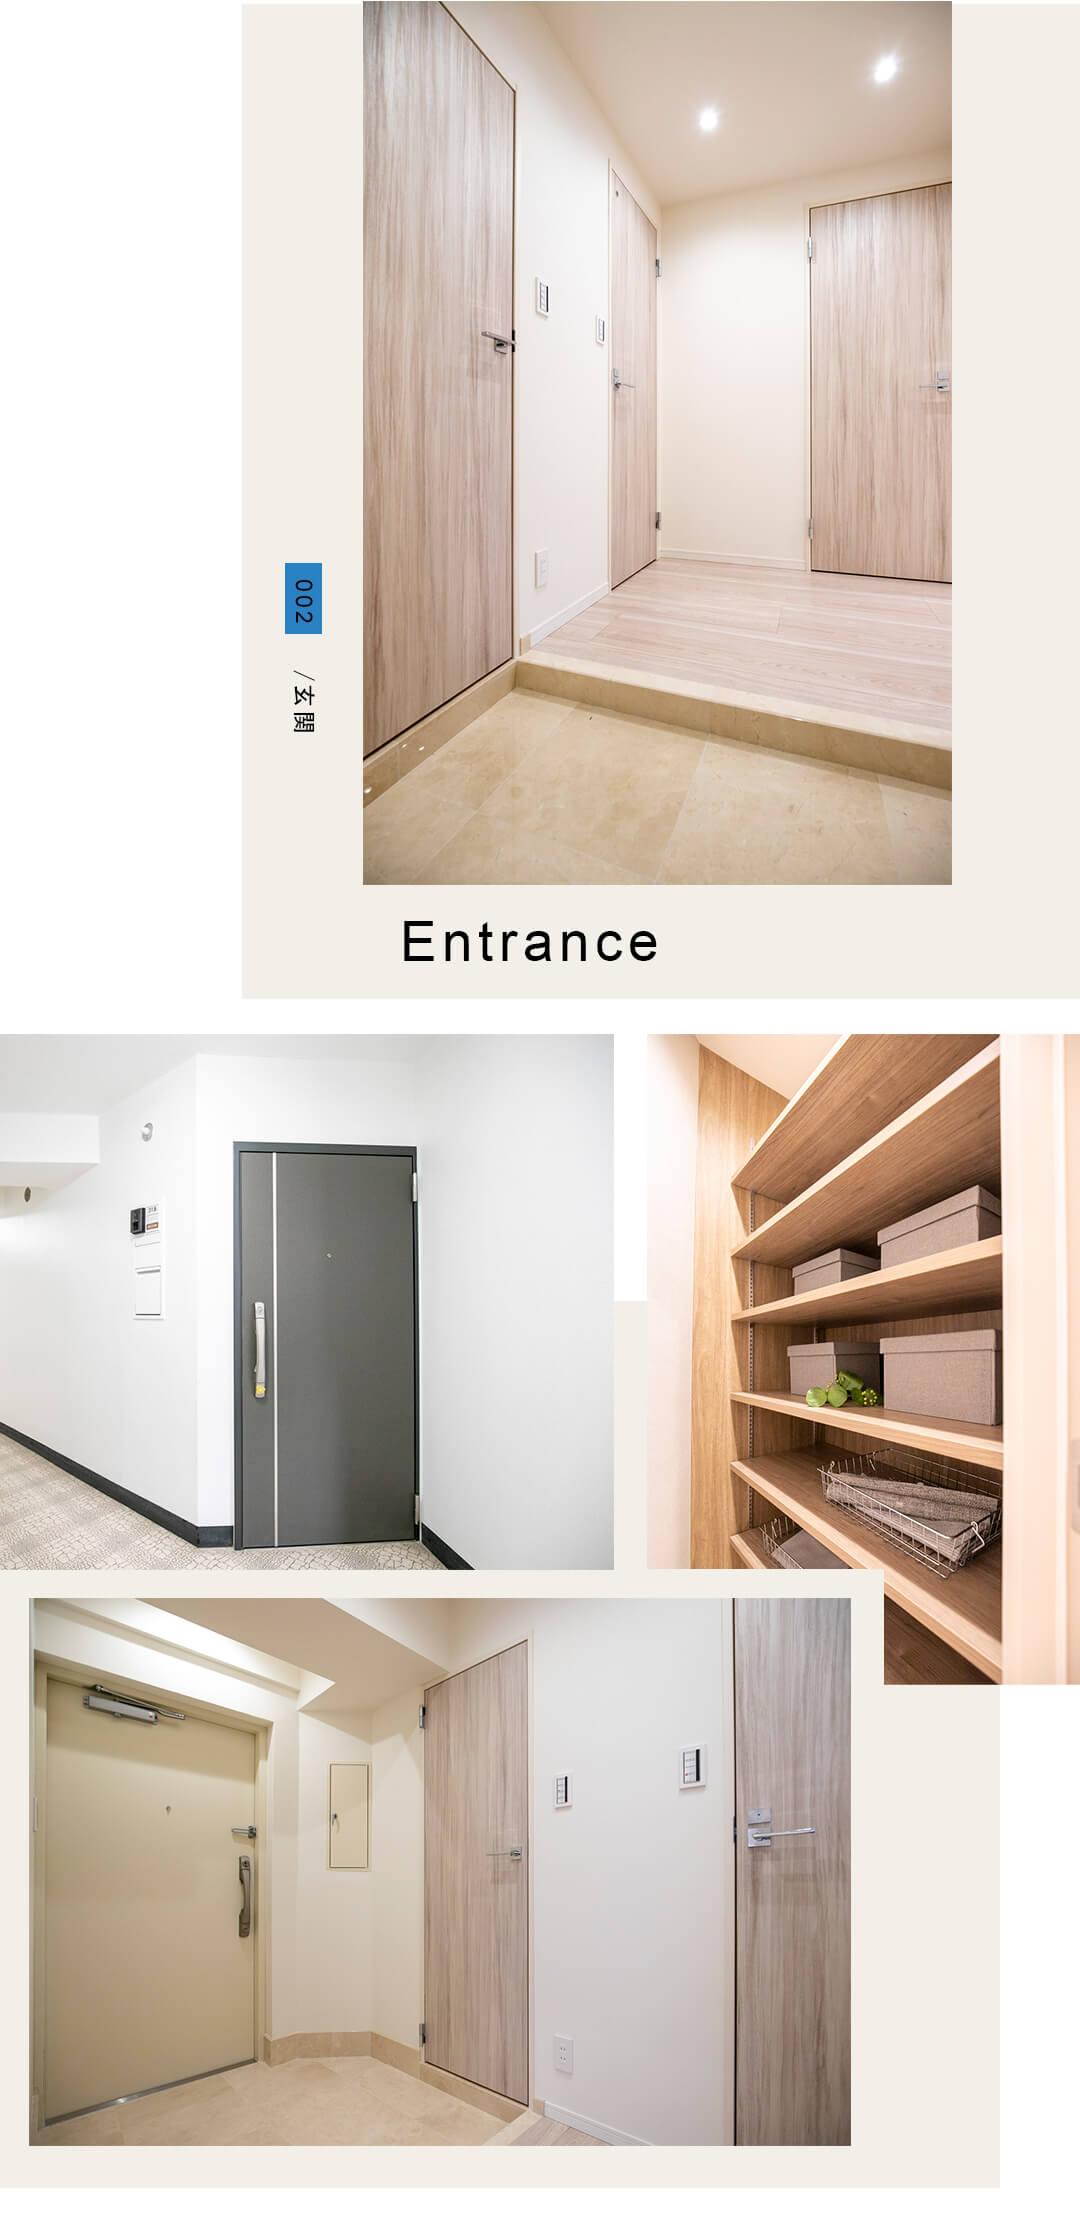 002.Entrance,玄関